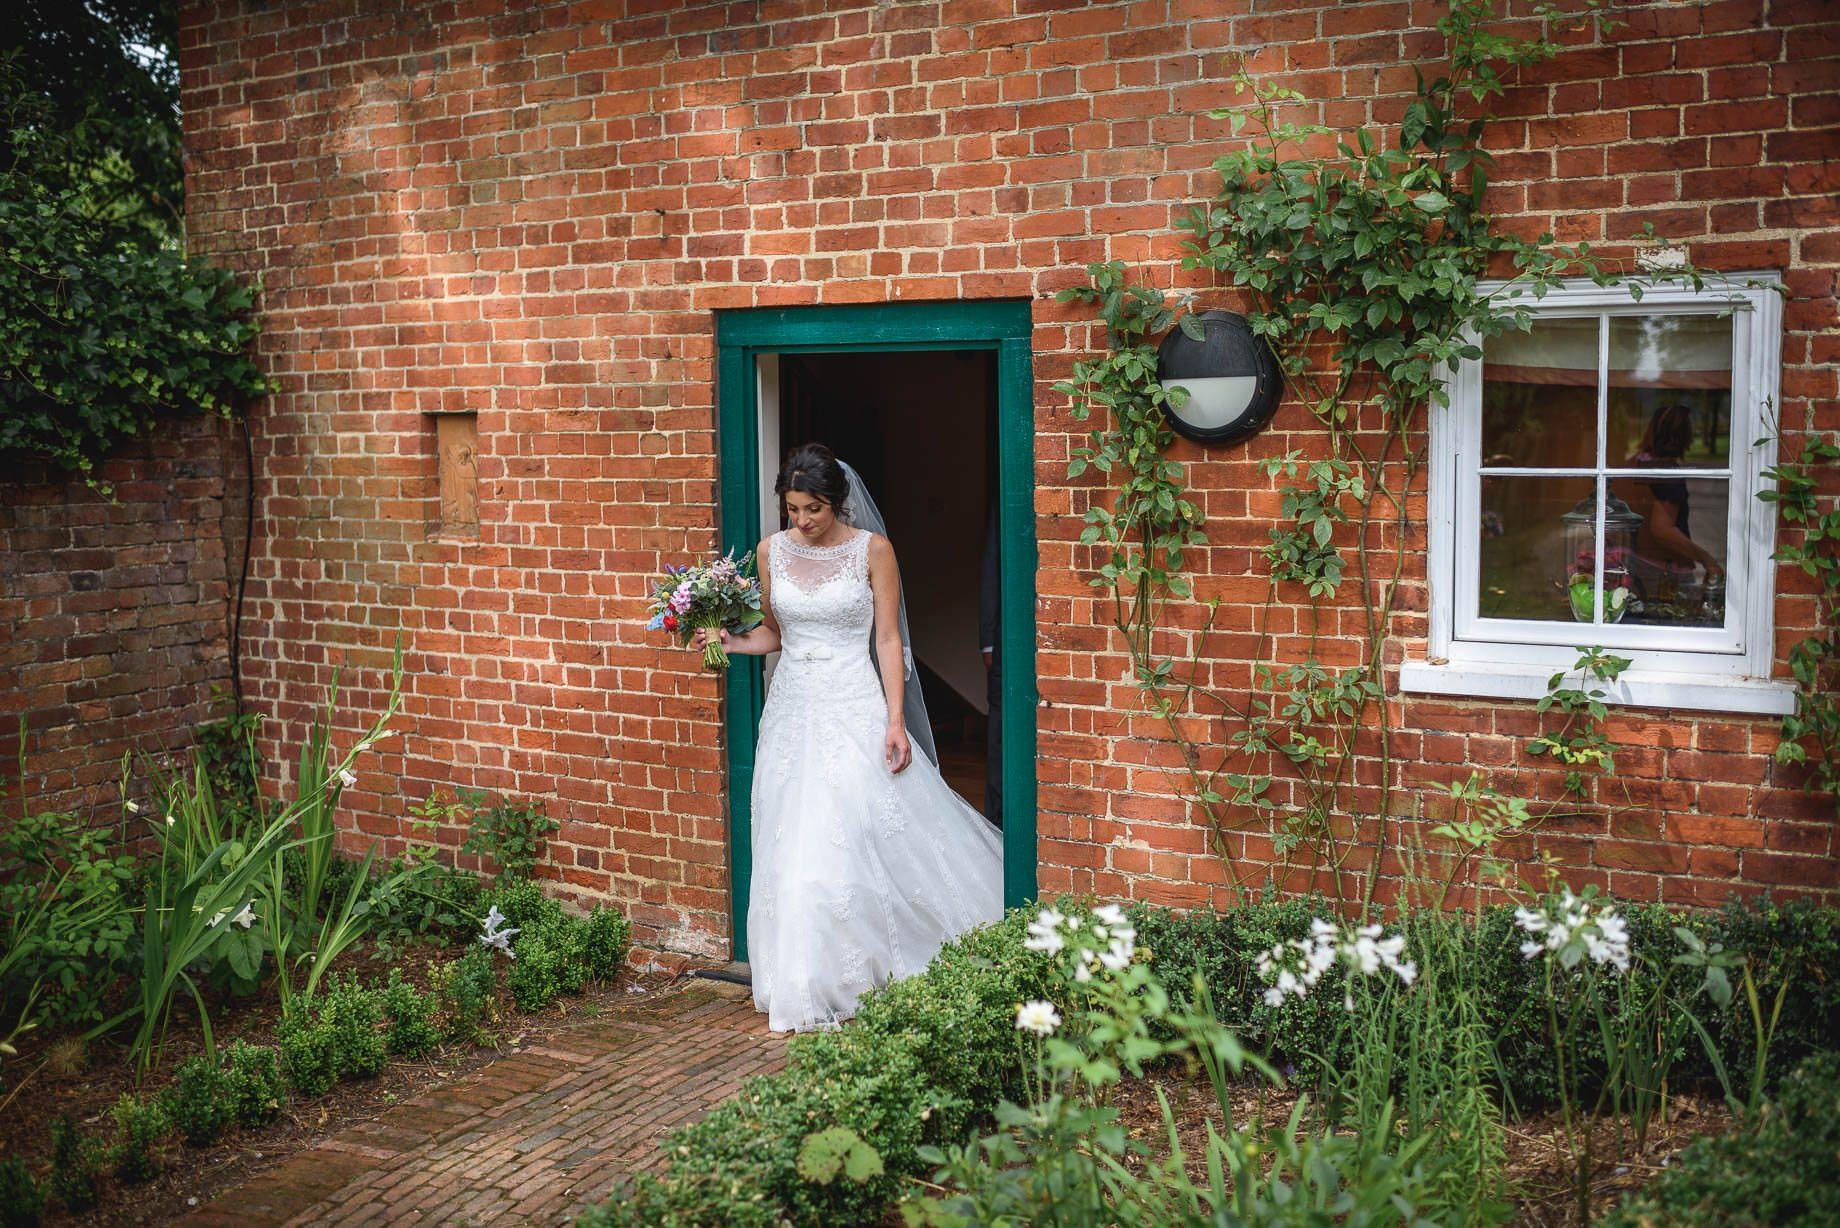 Gaynes Park wedding photography - Guy Collier Photography - Rachel and Jon (57 of 169)